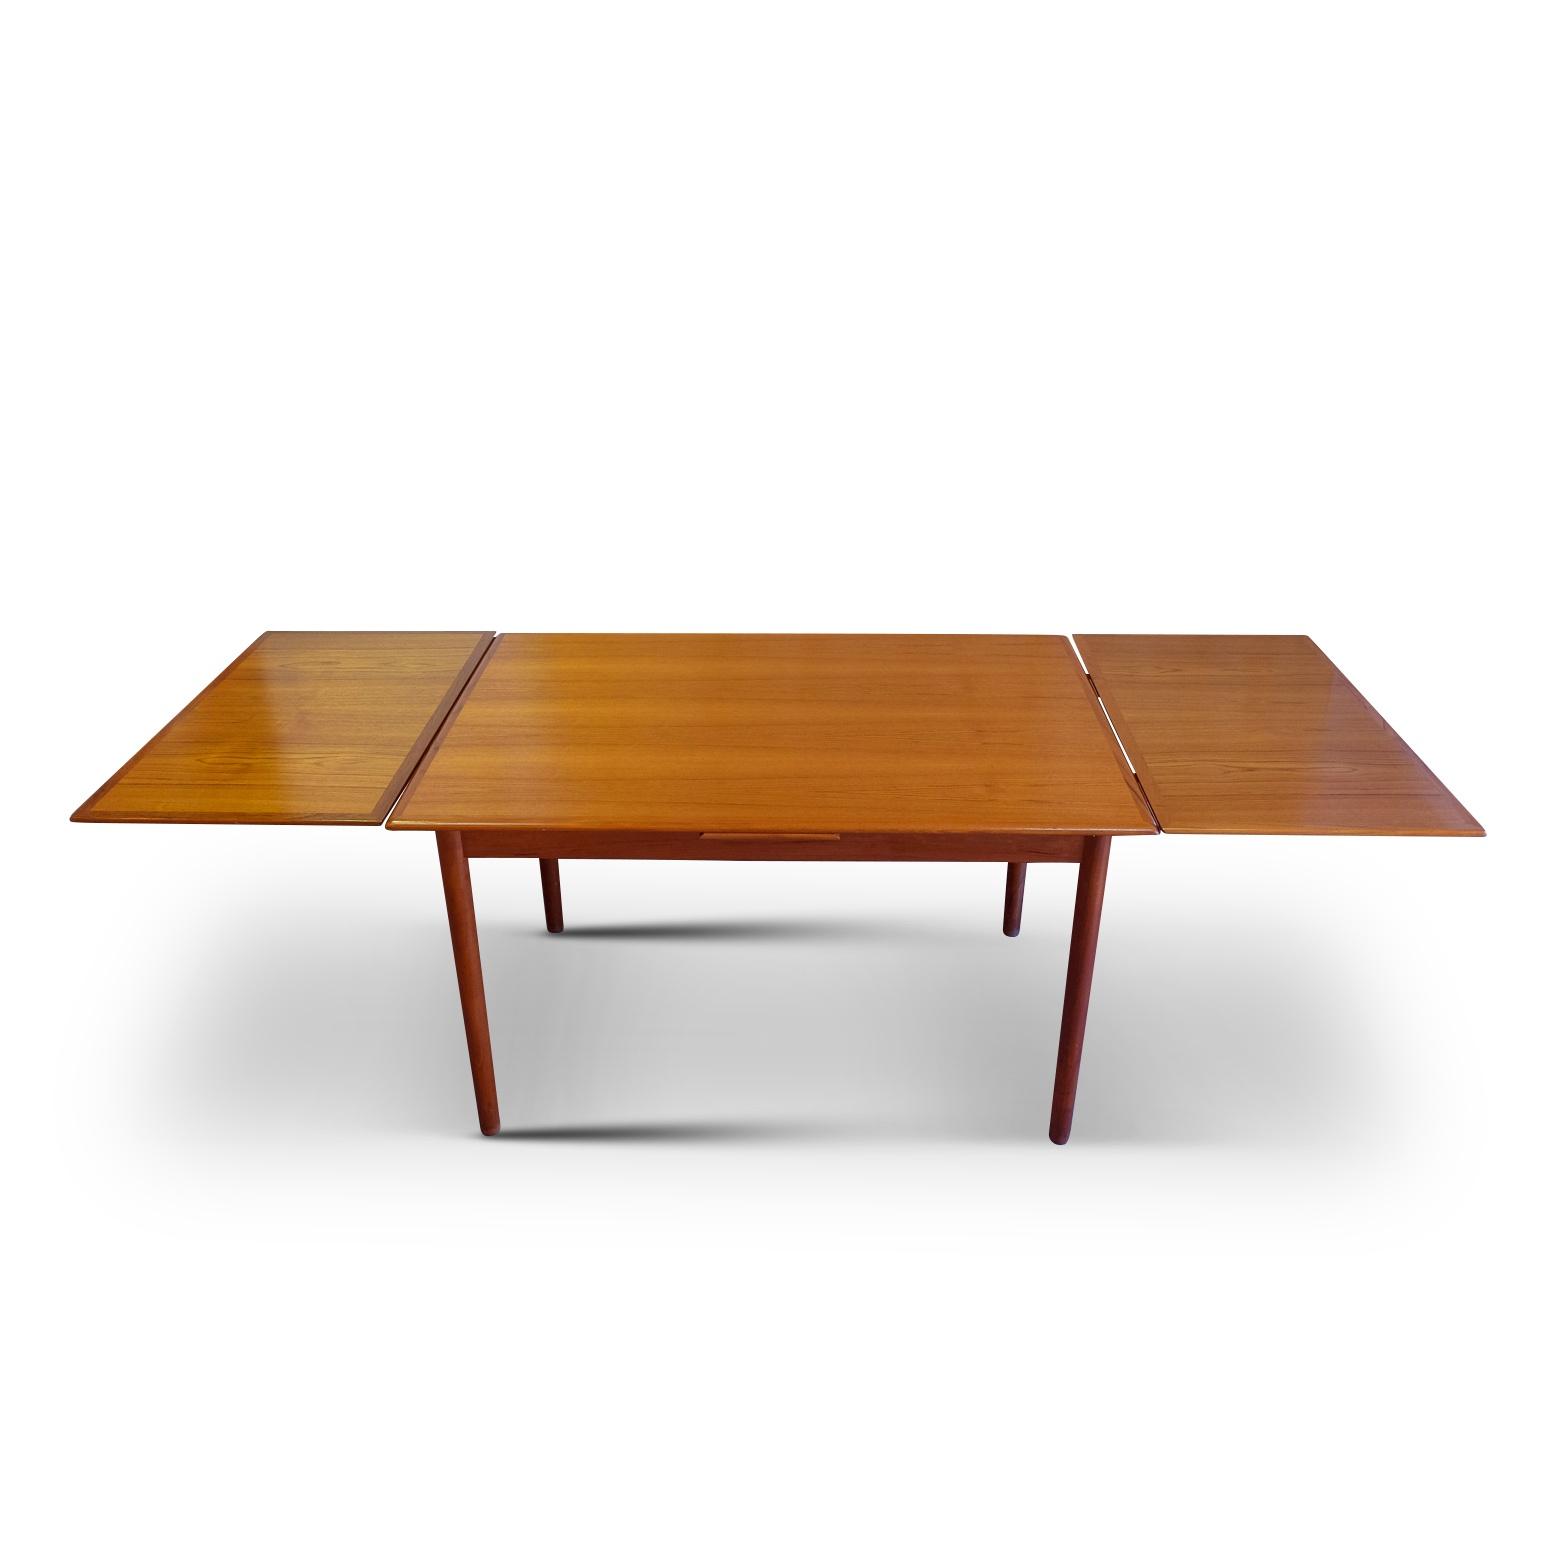 Teak Dining Table, Danish origin and good vintage condition.